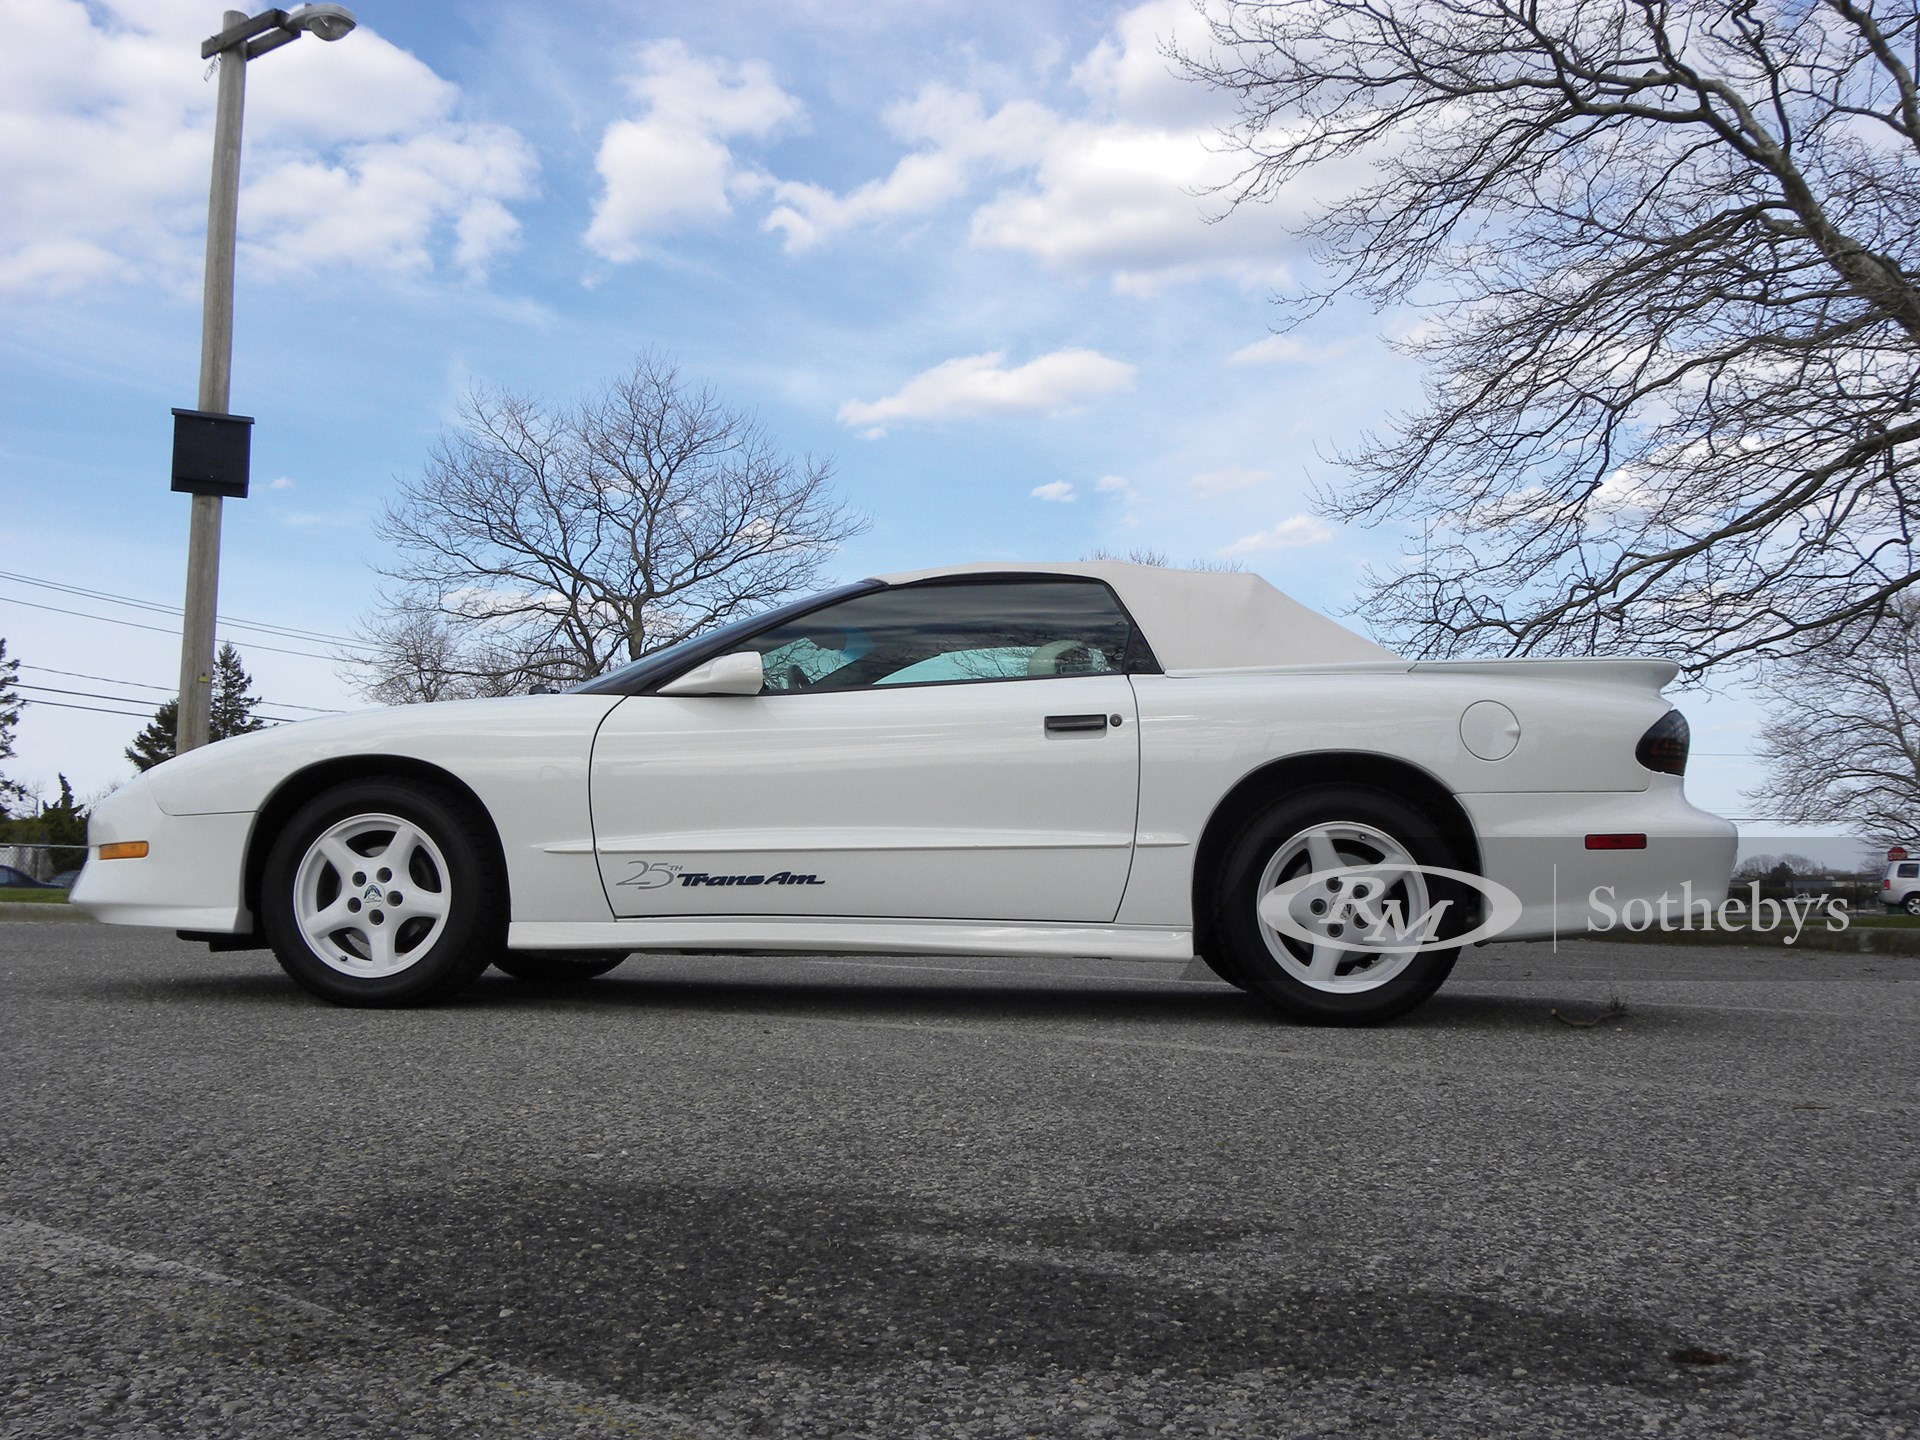 1994 Pontiac Firbird Trans Am 25th Anniversary Convertible